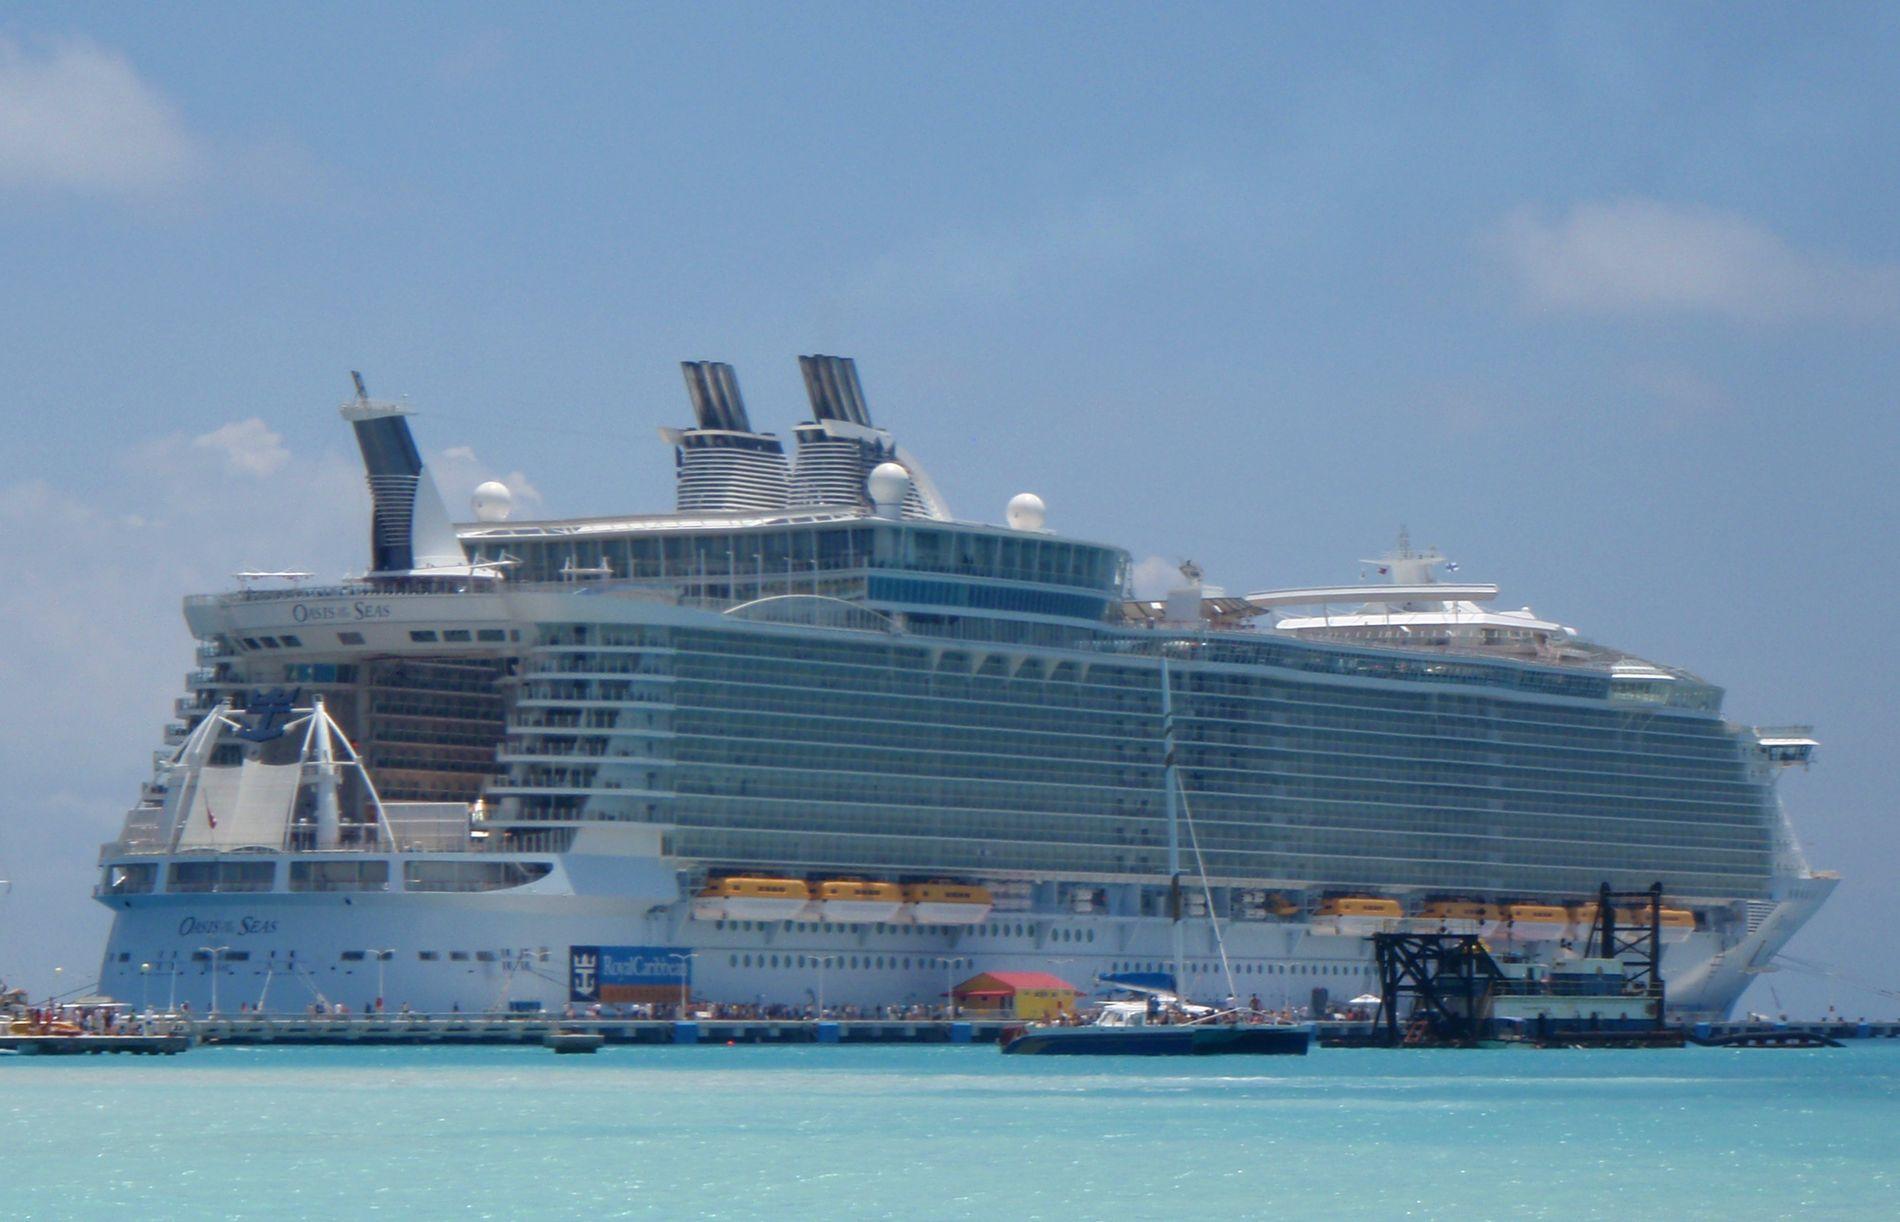 royal caribbean oasis of the seas - HD1900×1222